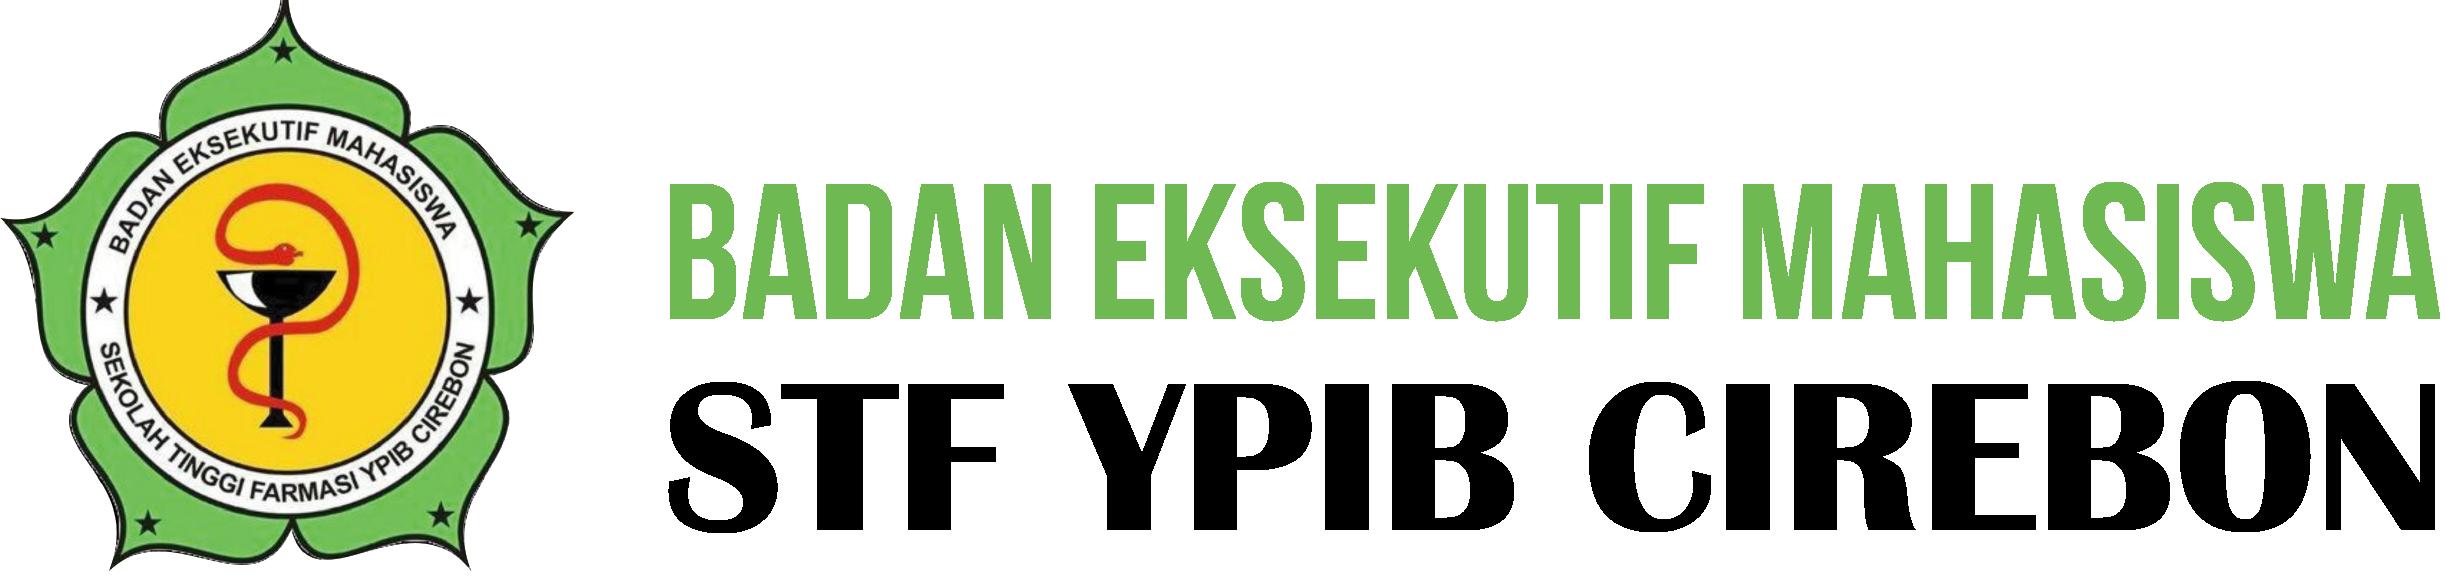 LKMMF 1 2019 BEM STF YPIB Cirebon